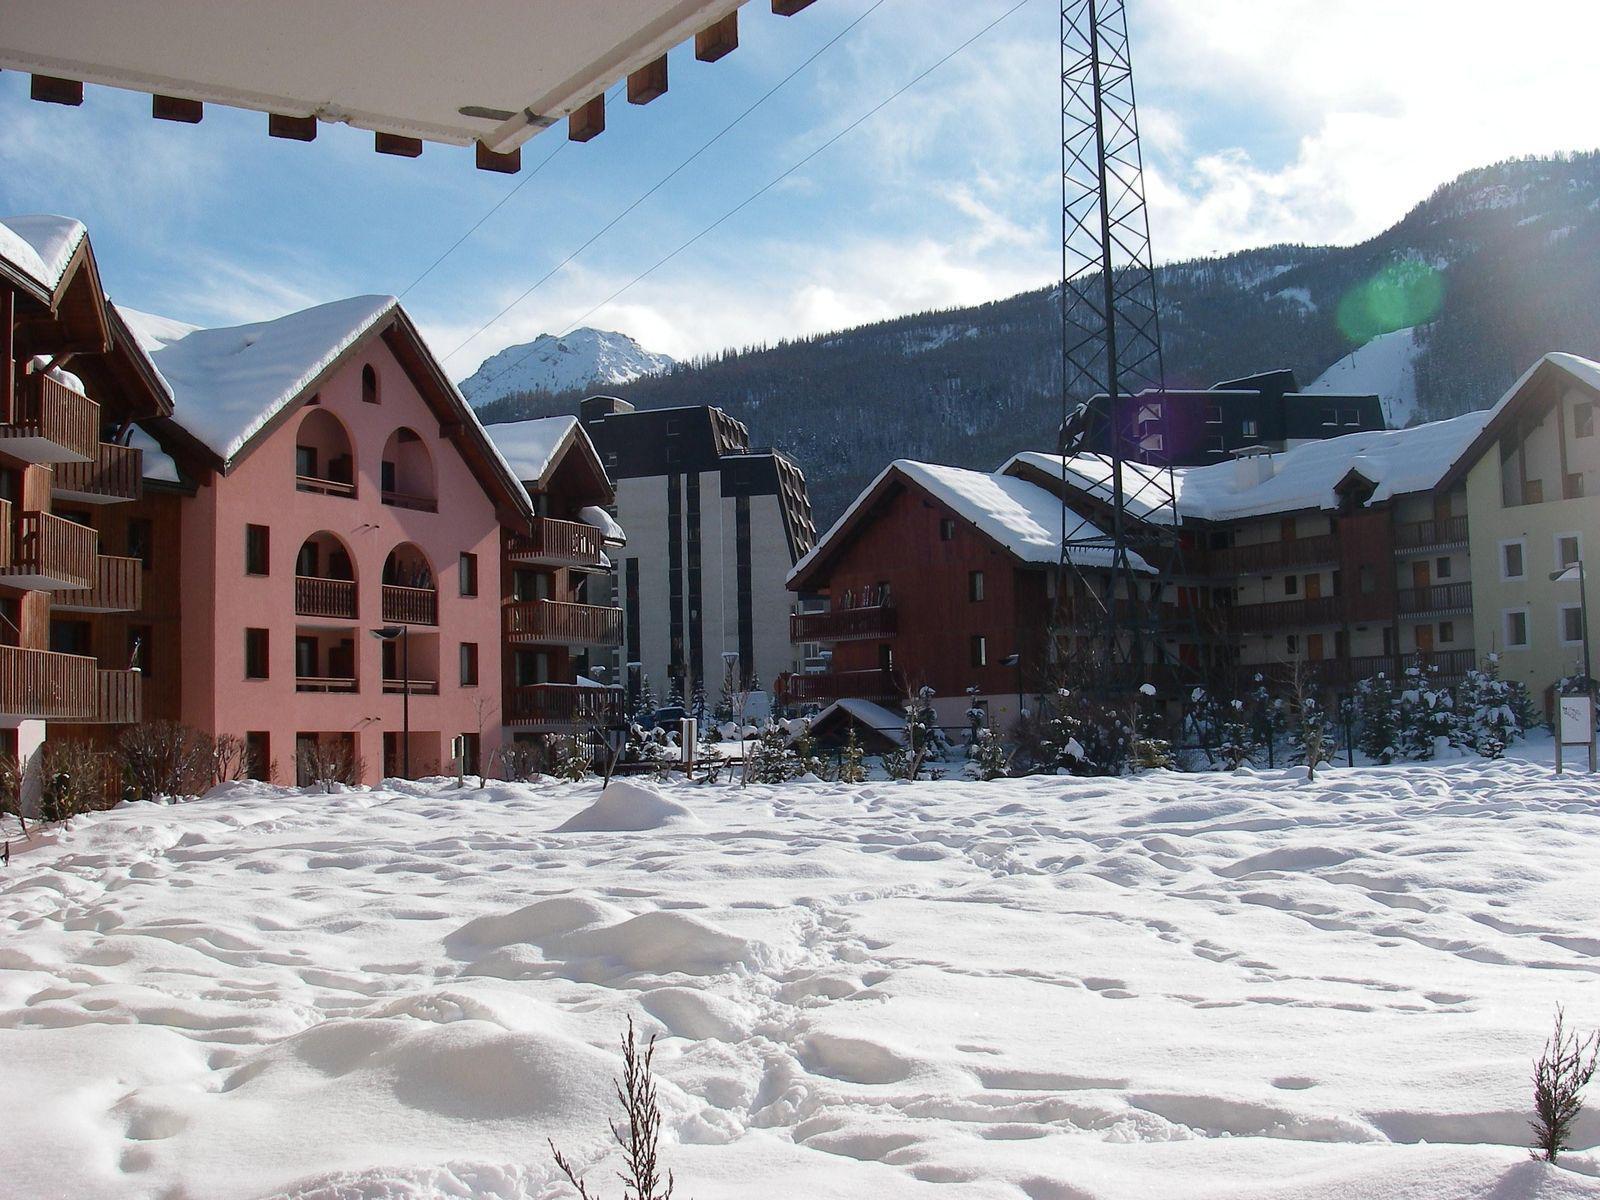 Station de ski de Serre Chevalier_La Salle-les-Alpes